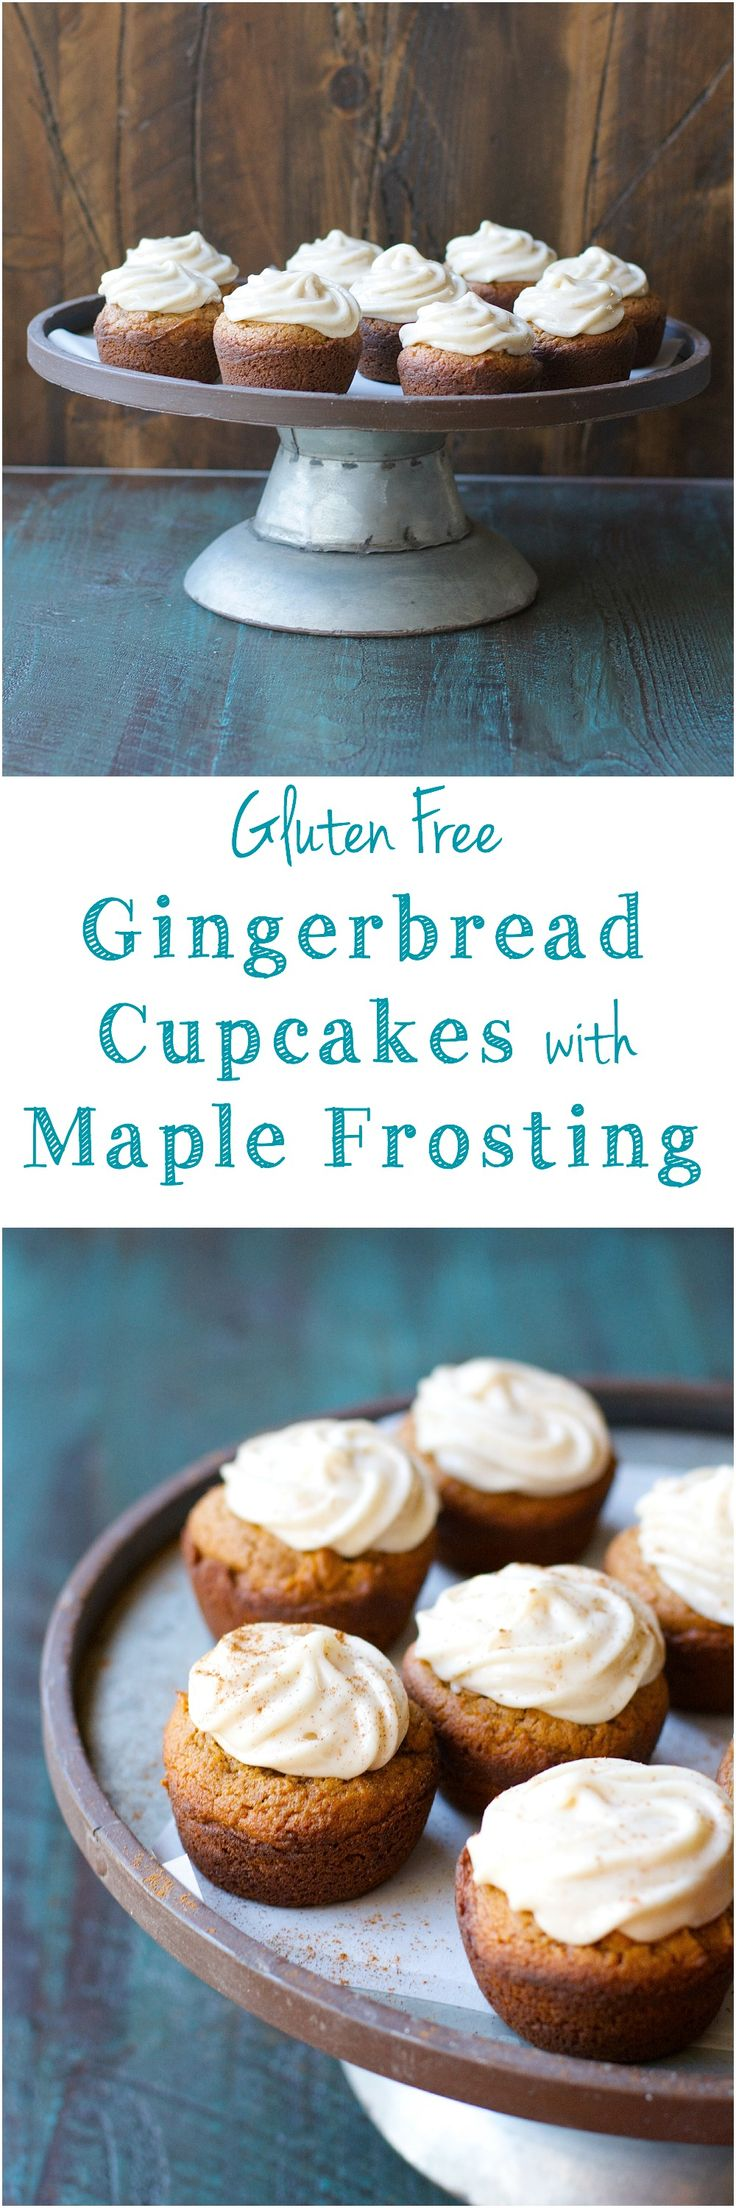 182 best Dessert - Cupcakes images on Pinterest